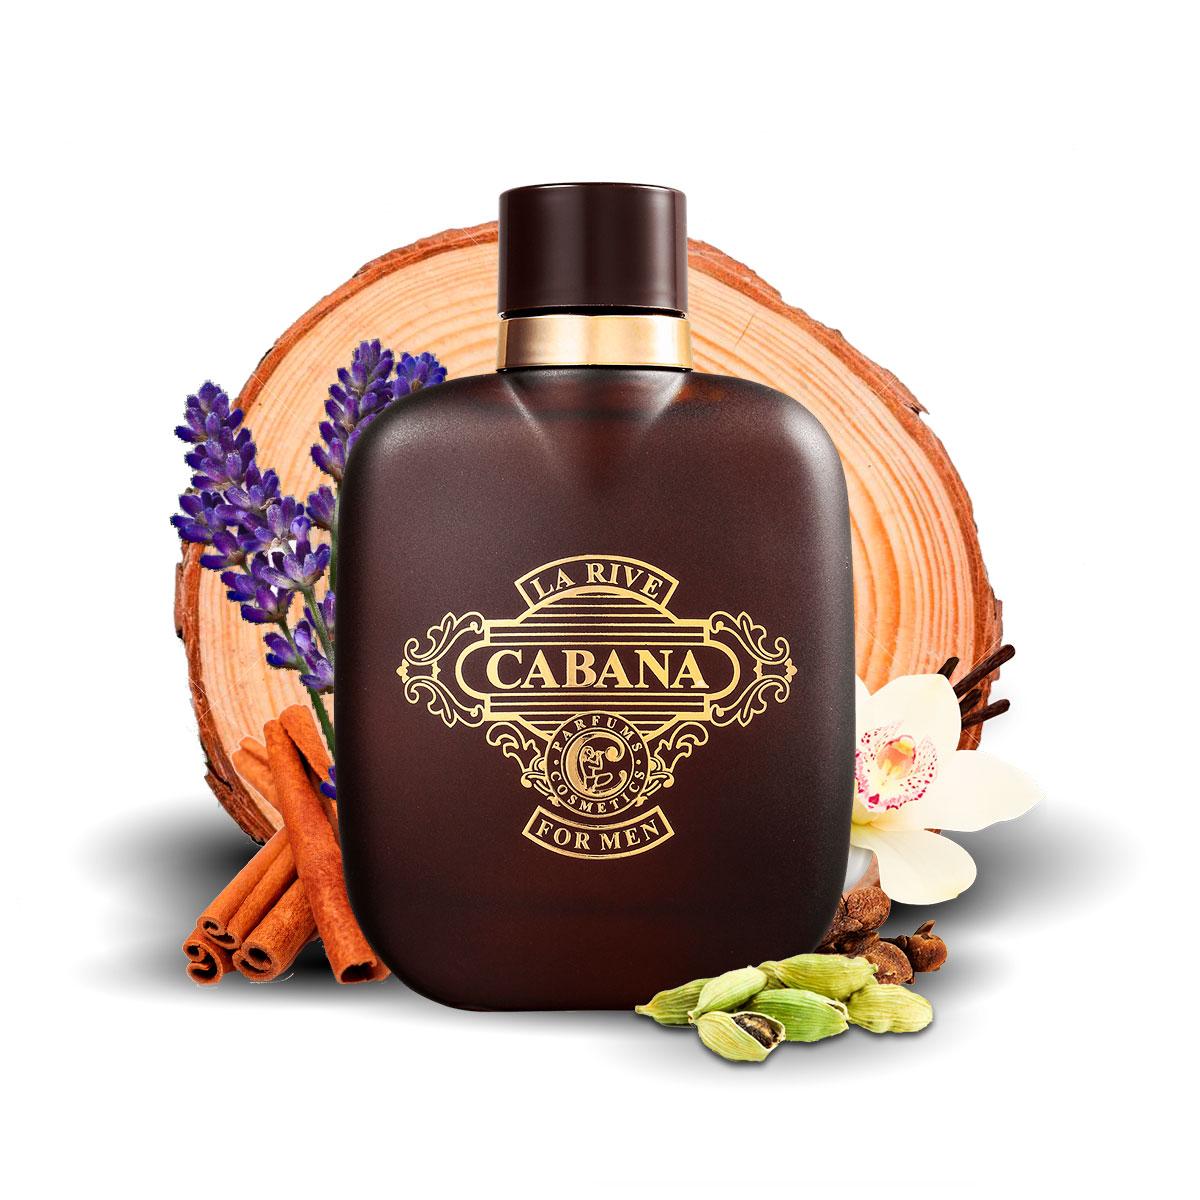 Kit 2 Perfumes Importados Miss Dream e Cabana La Rive